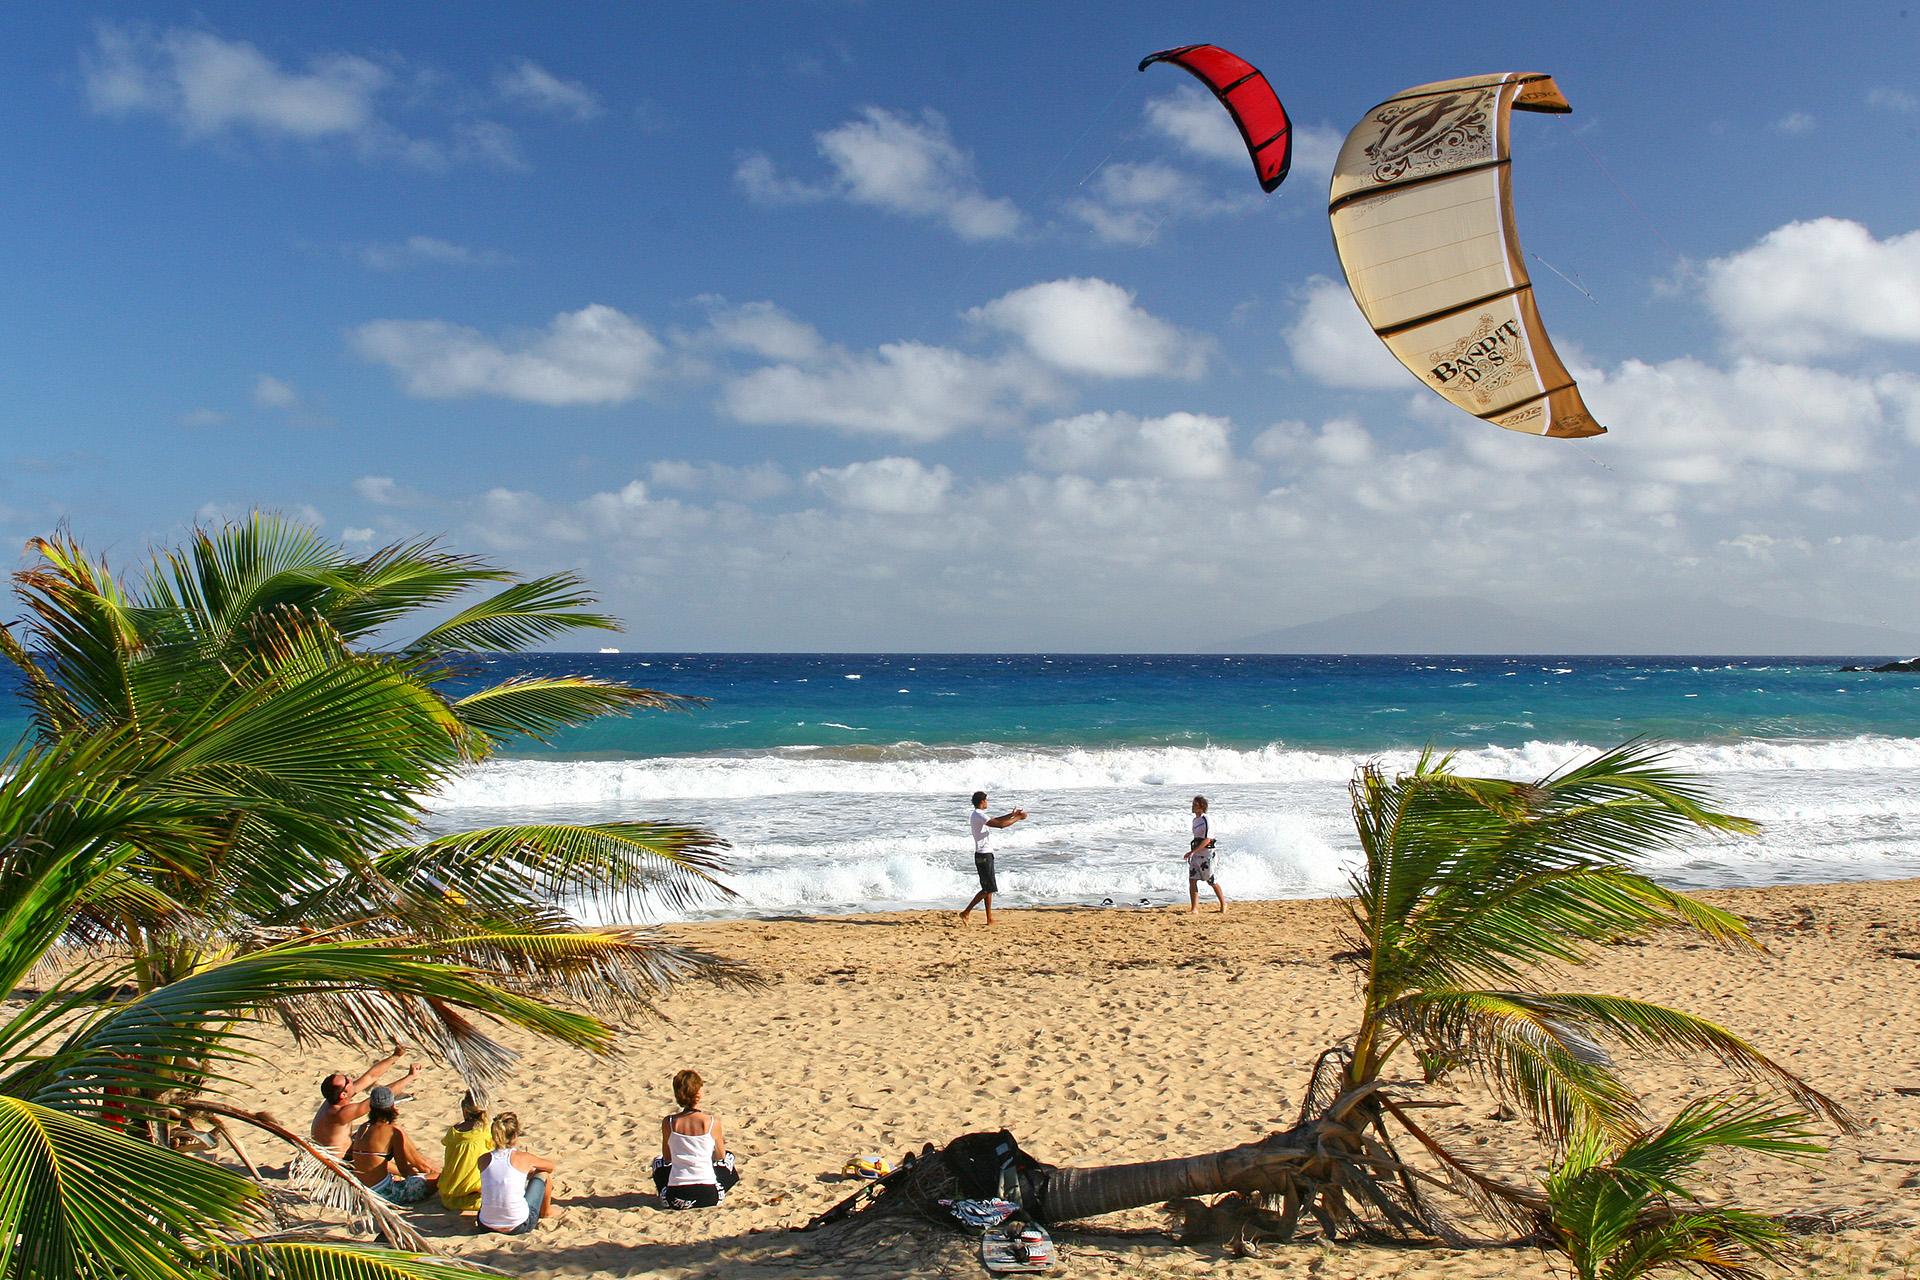 Kite plage de Guadeloupe